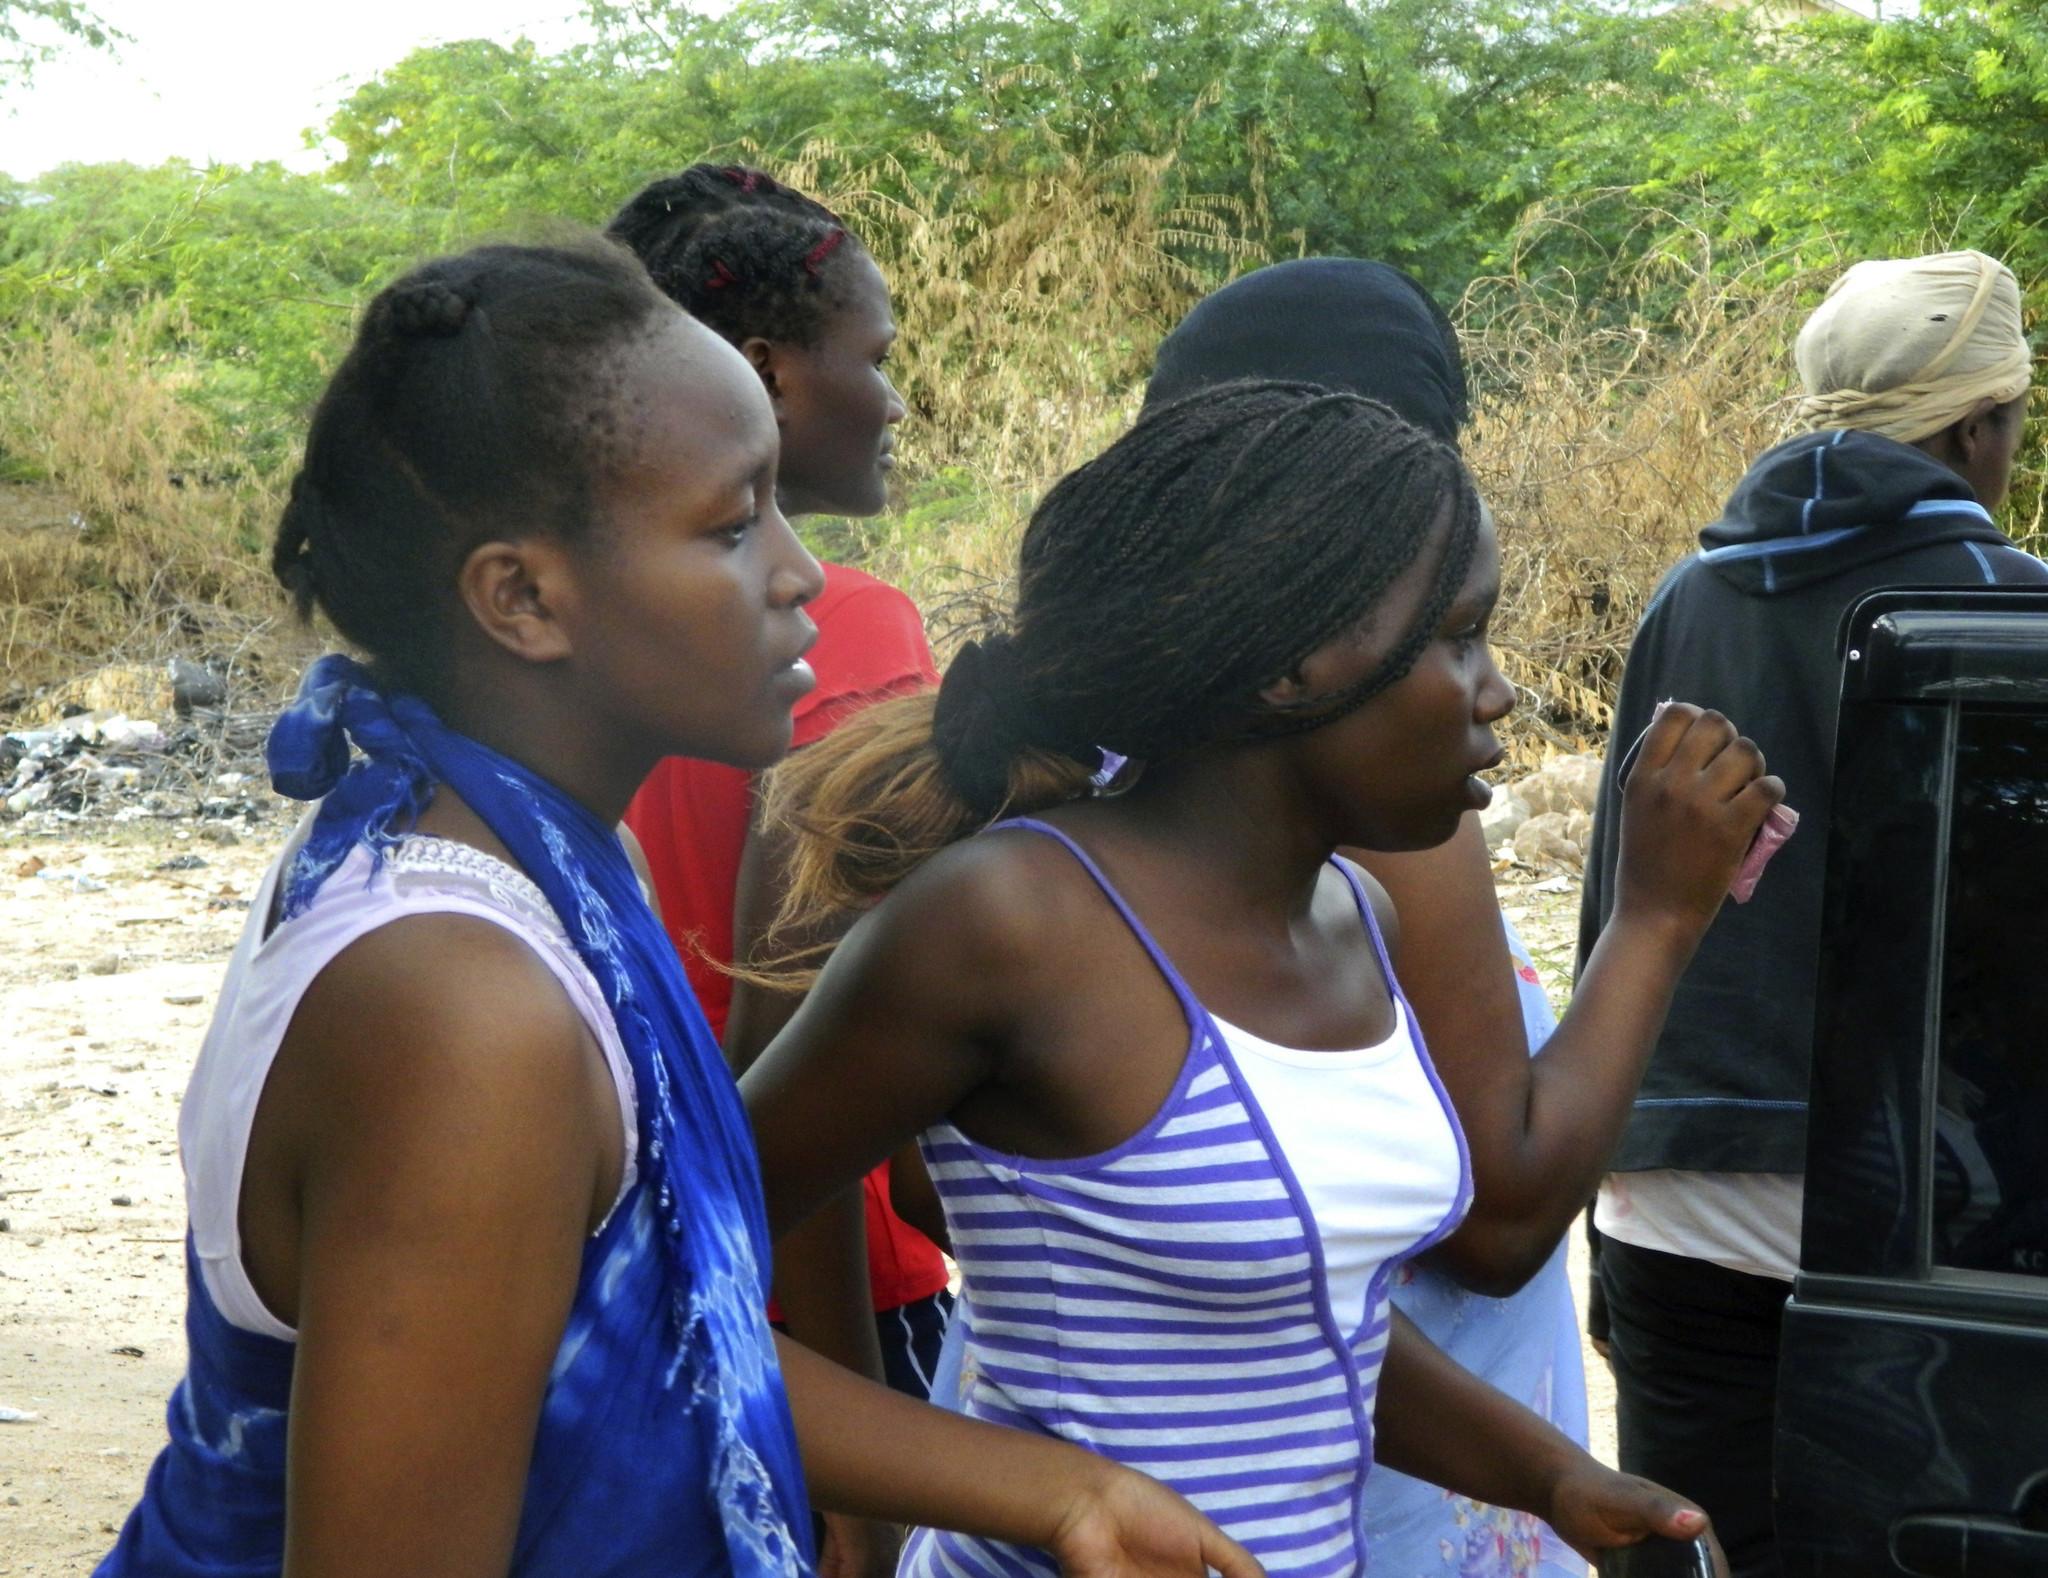 Kenya attack survivor says gunmen scouted campus, targeted Christians